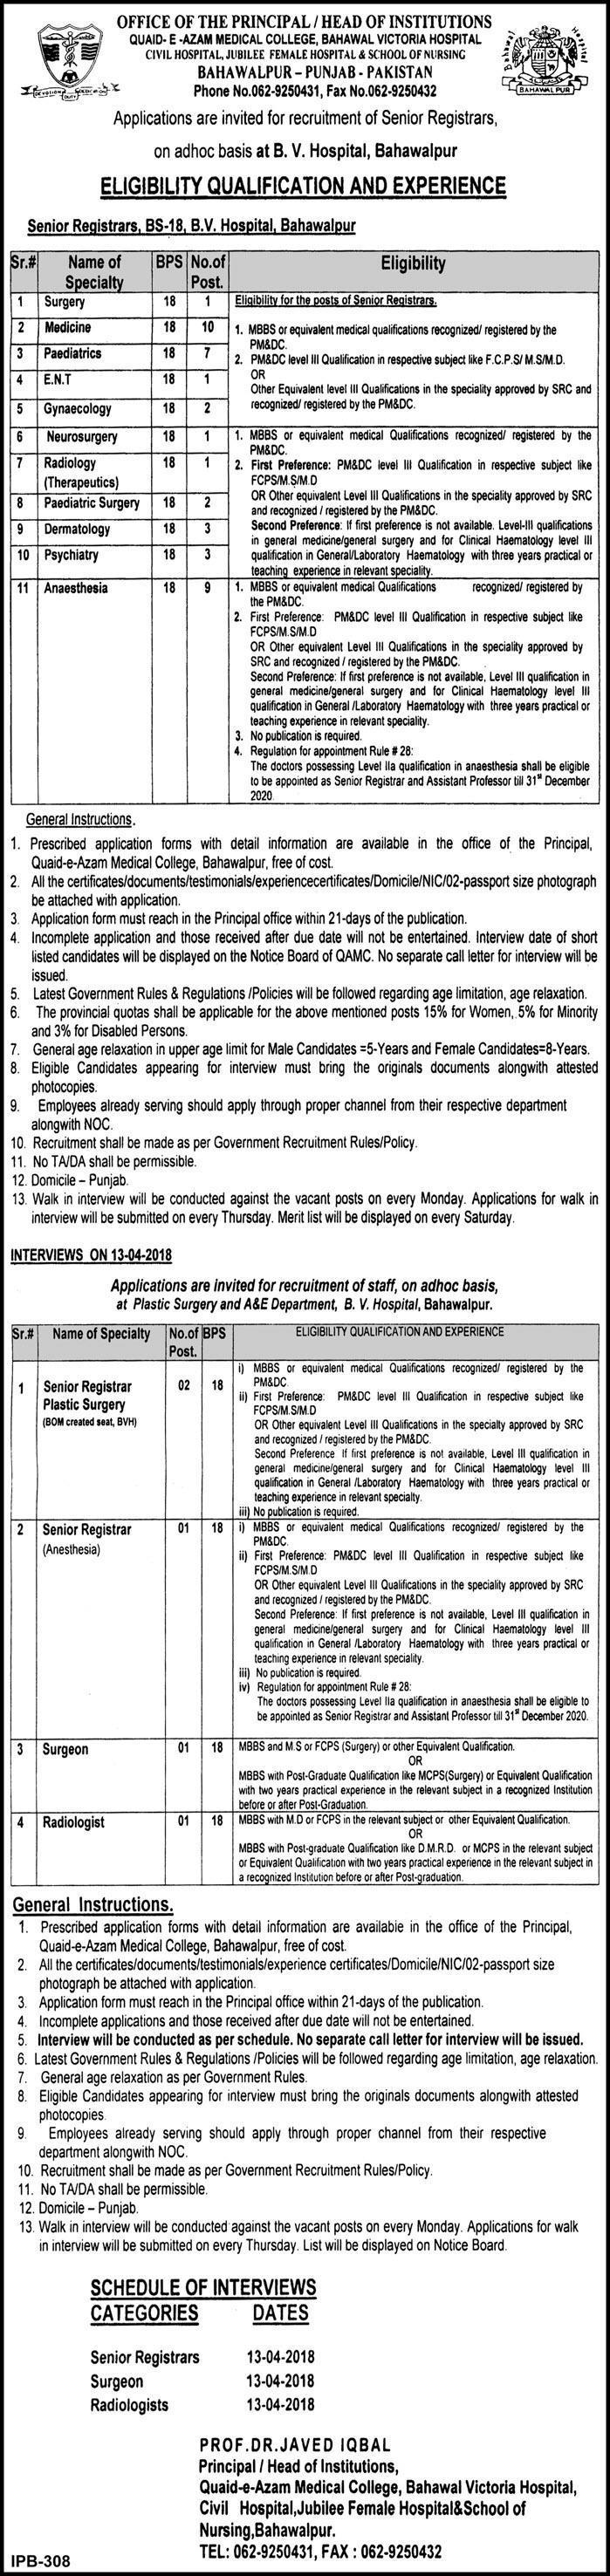 Bahawal Victoria Hospital 45 Jobs 22 March 2018 Daily Express Newspaper